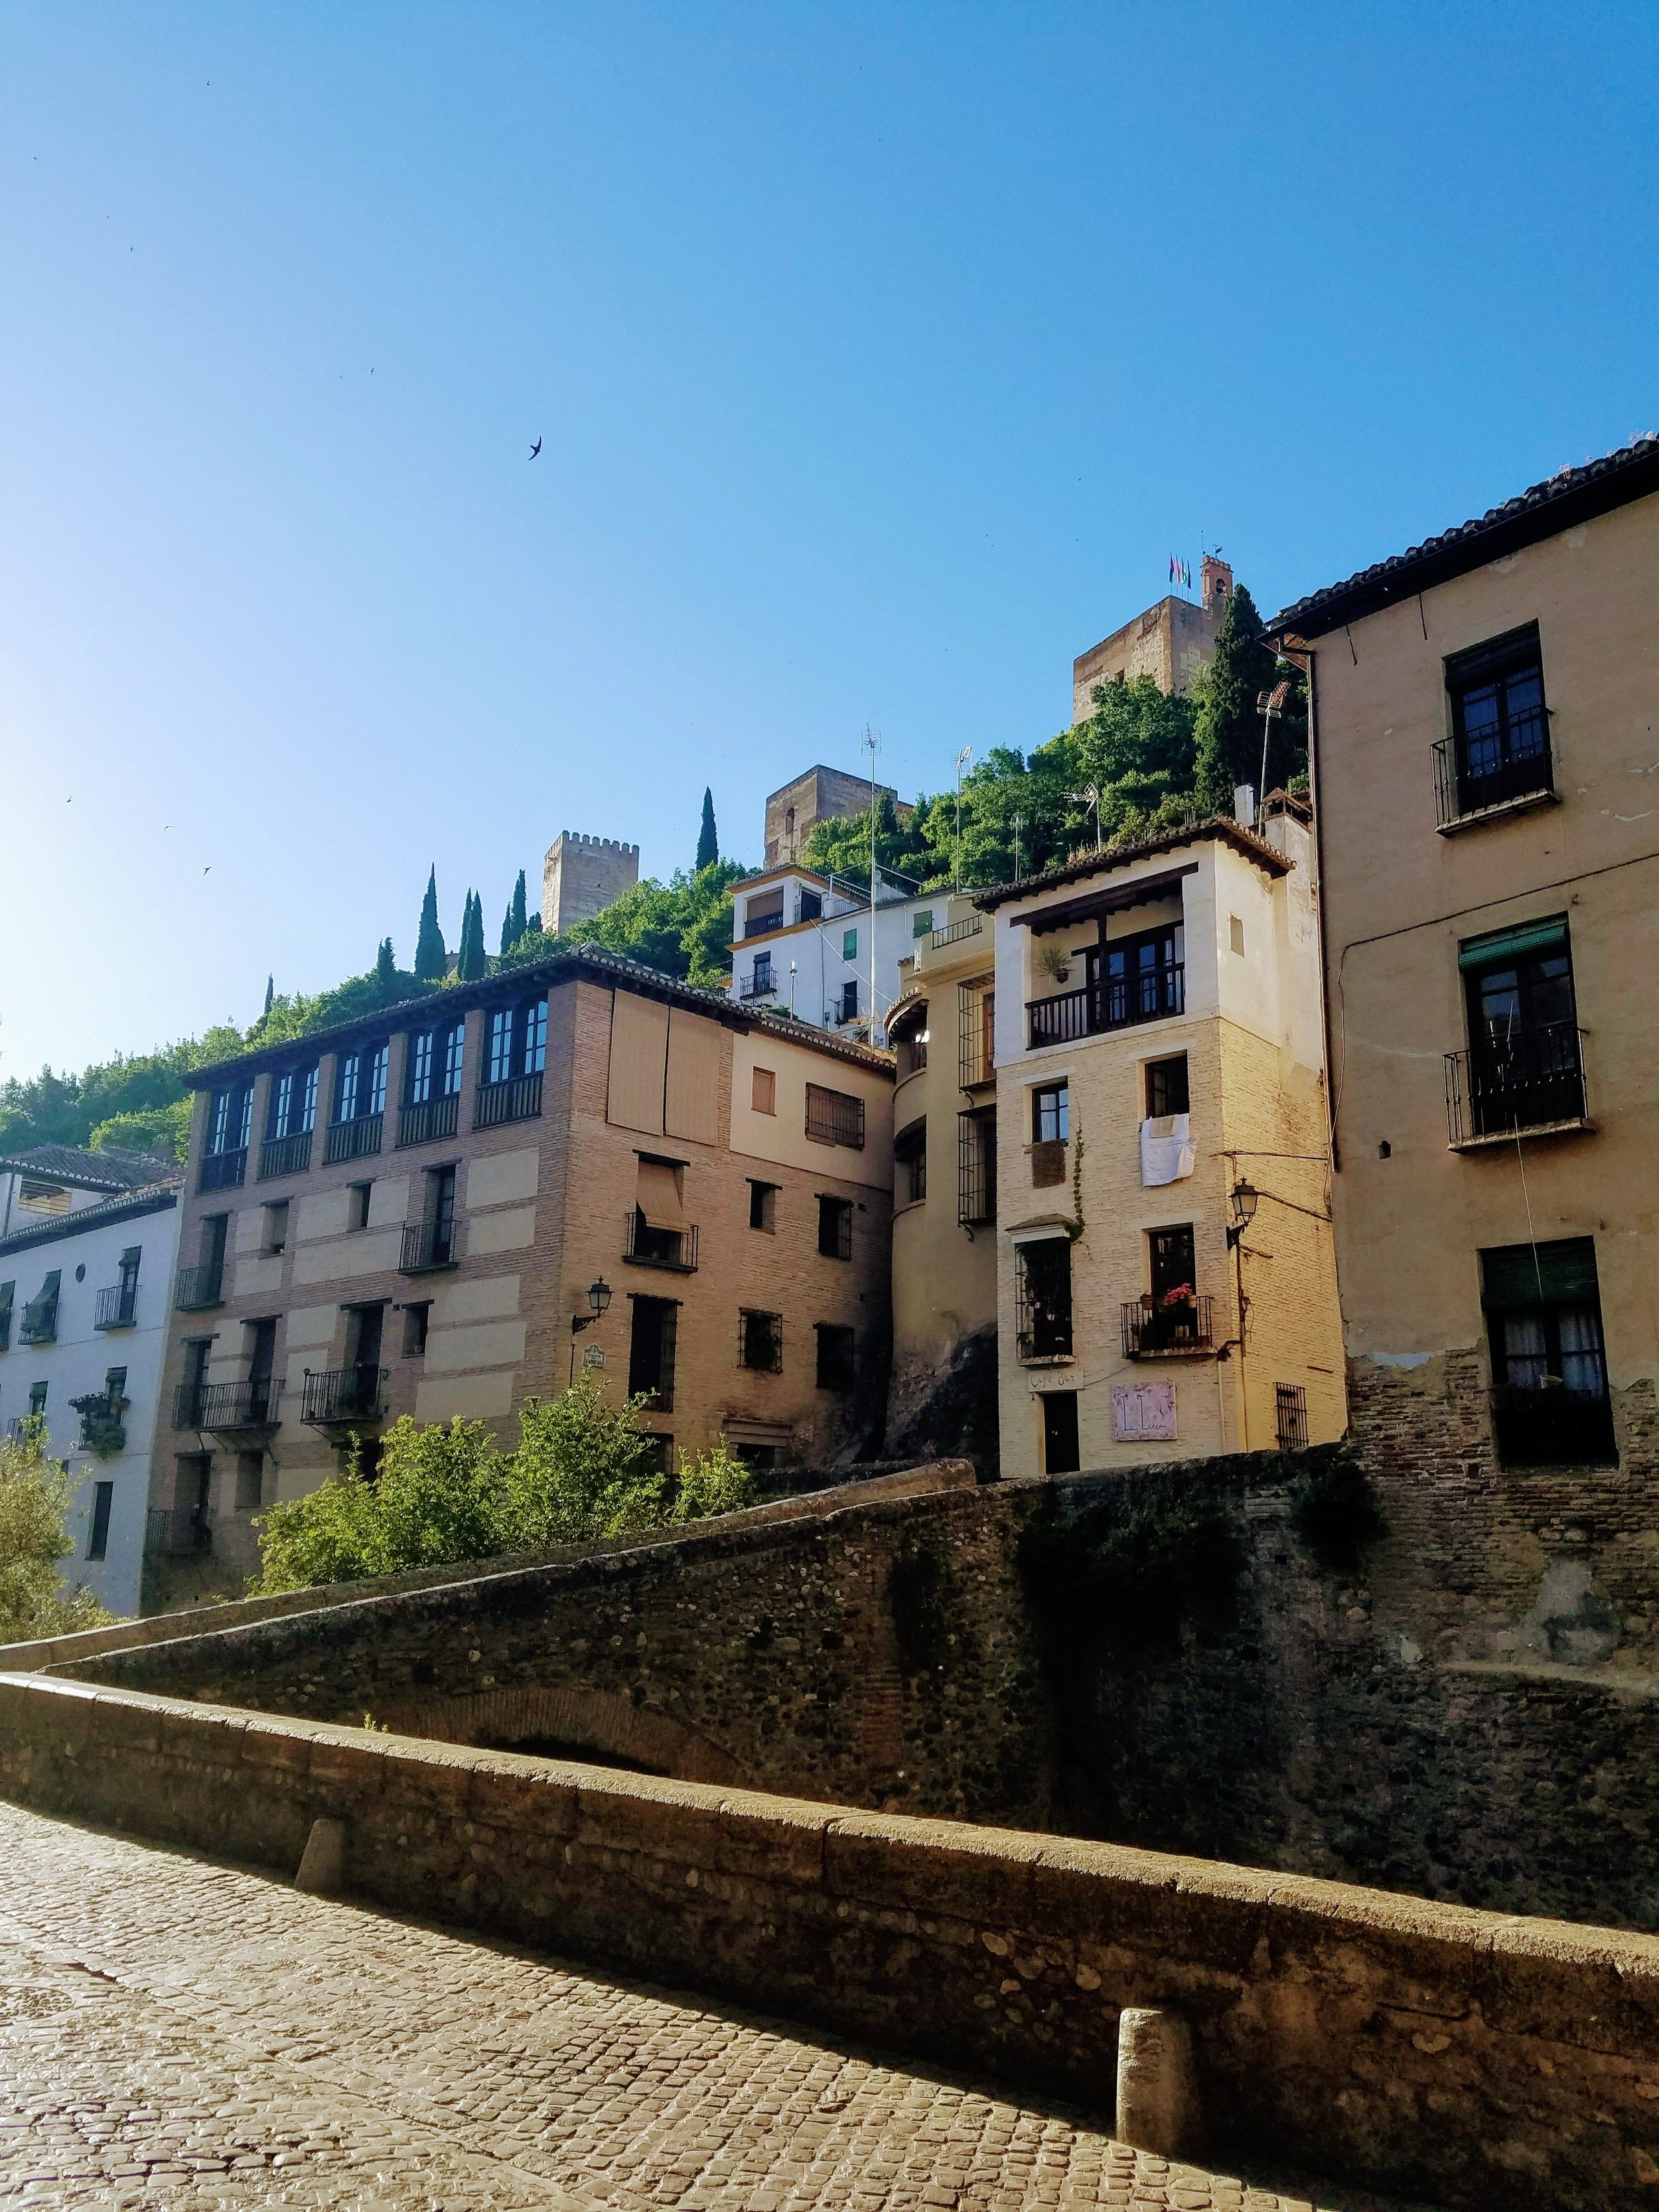 Alhambra from street level